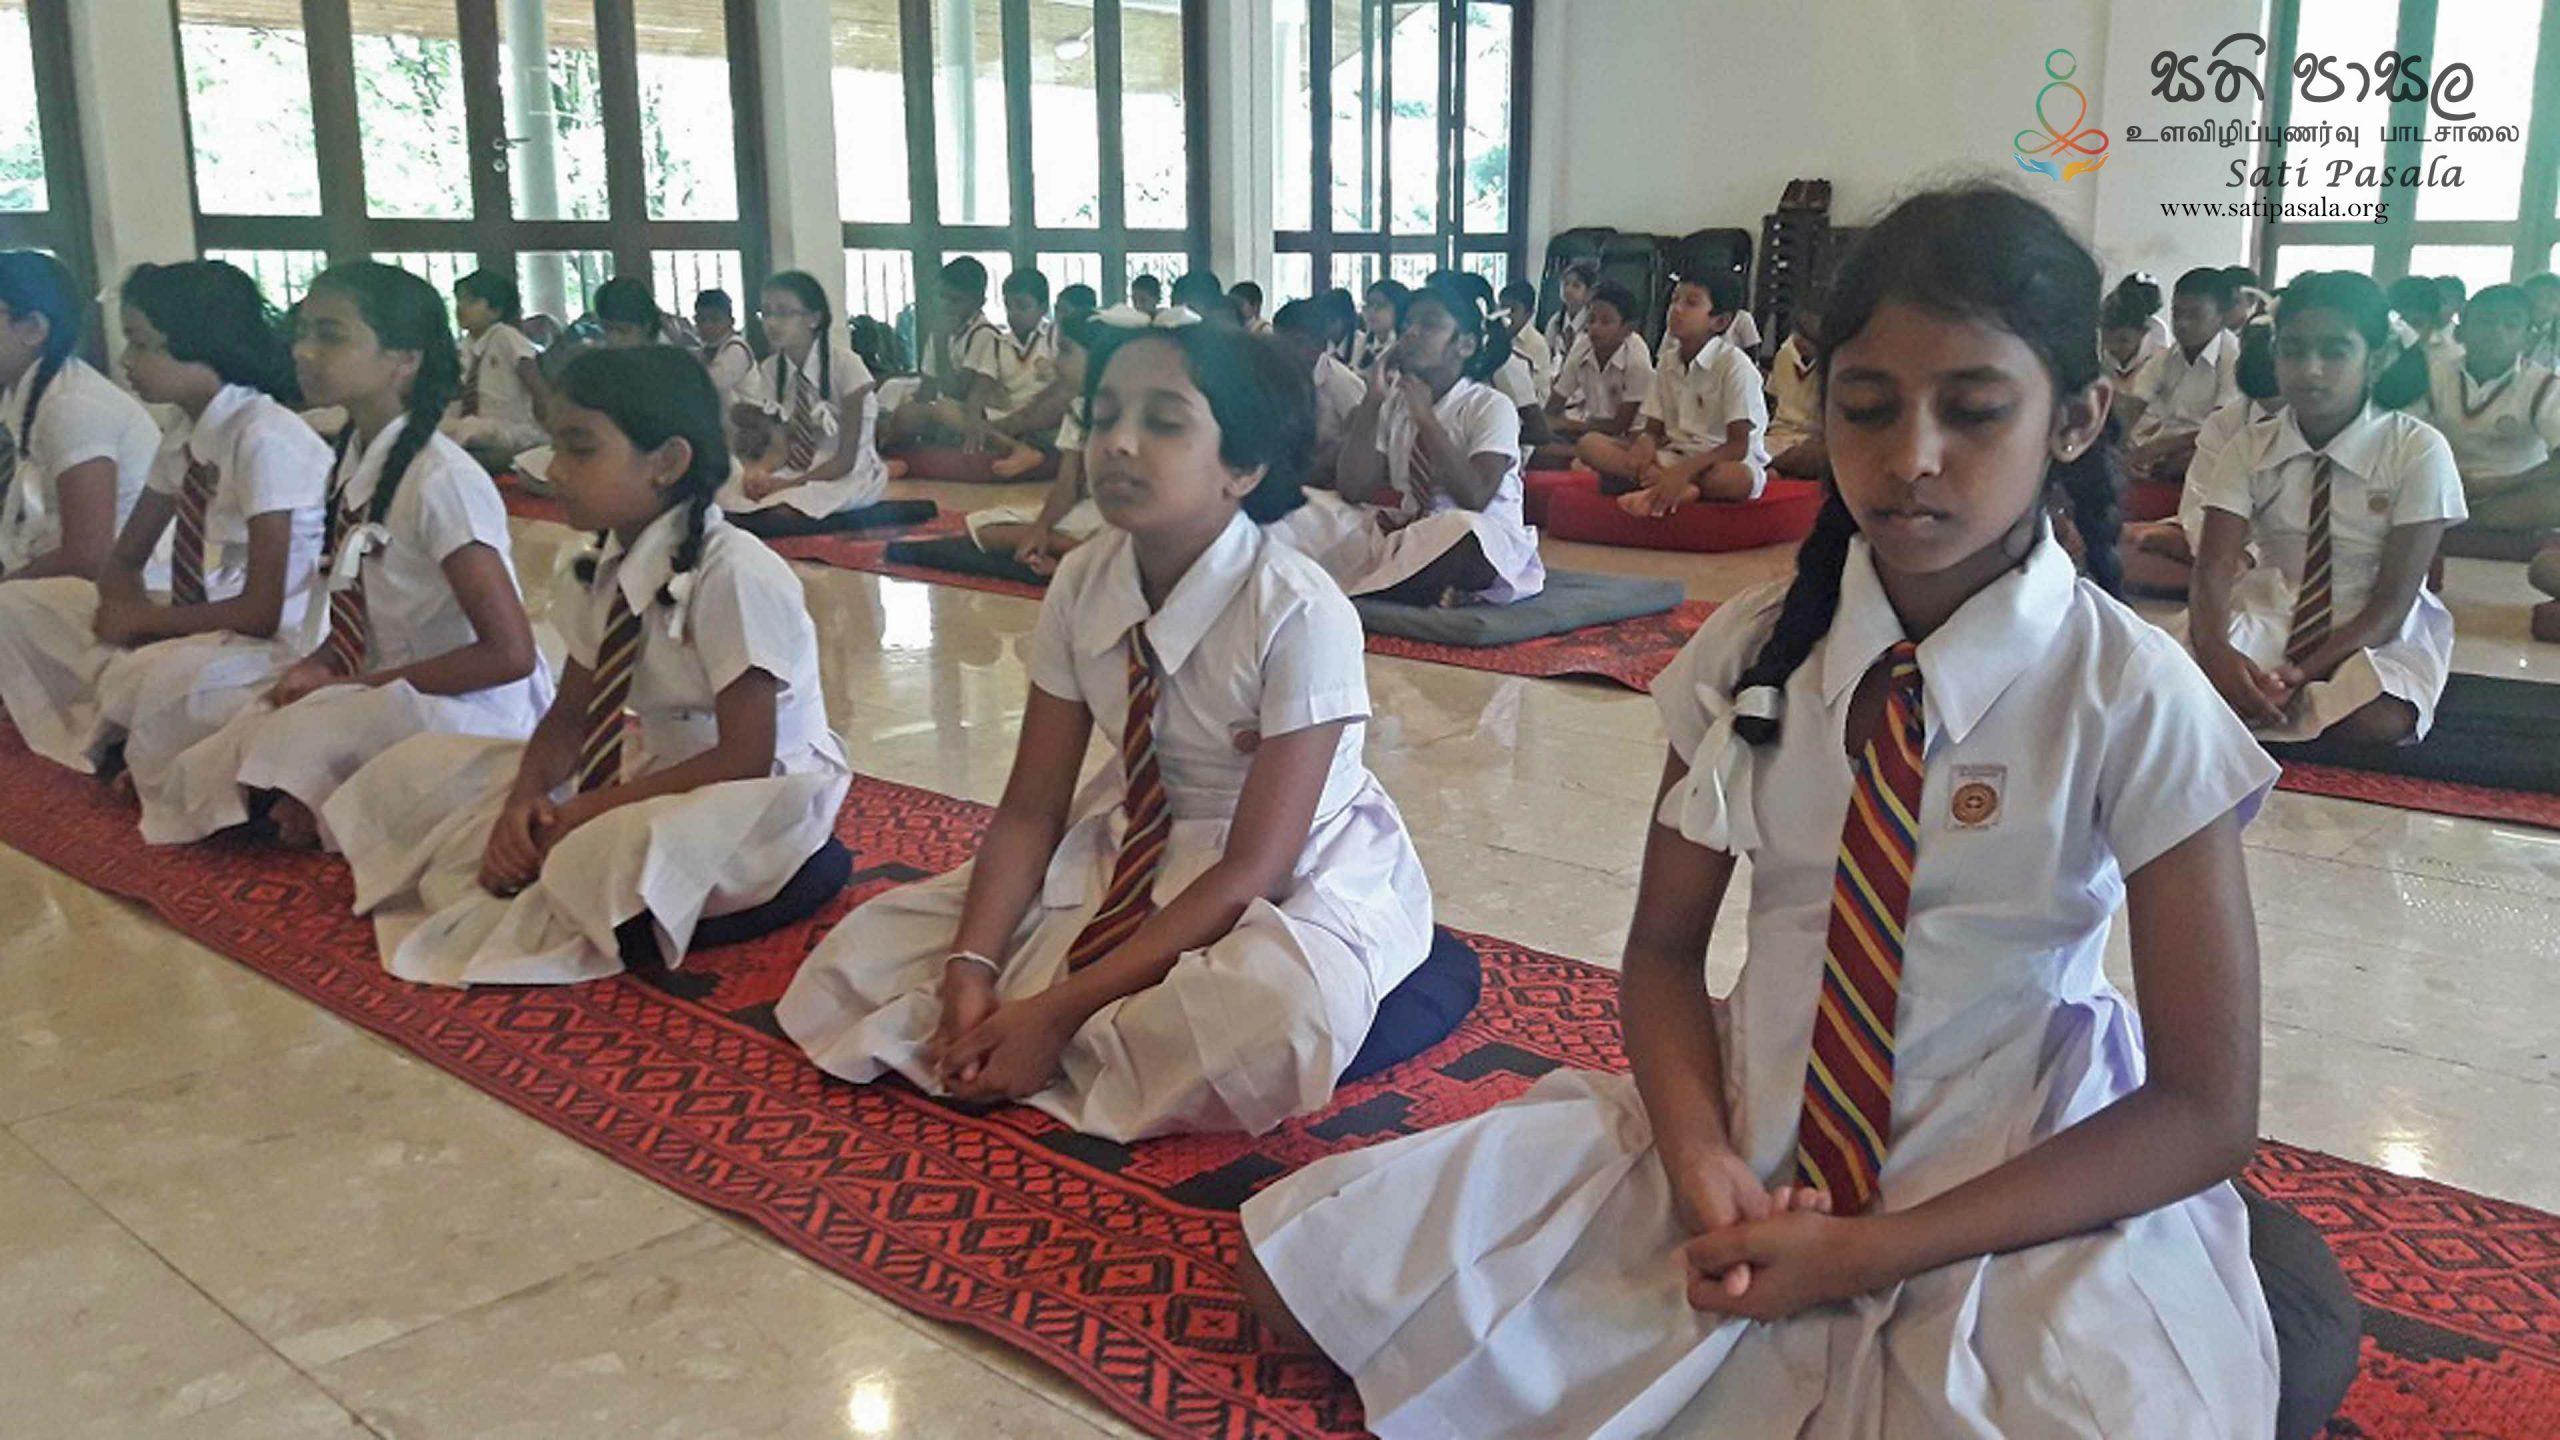 Sati Pasala Mindfulness Programme for Dheerananda College, Pilimathalawa